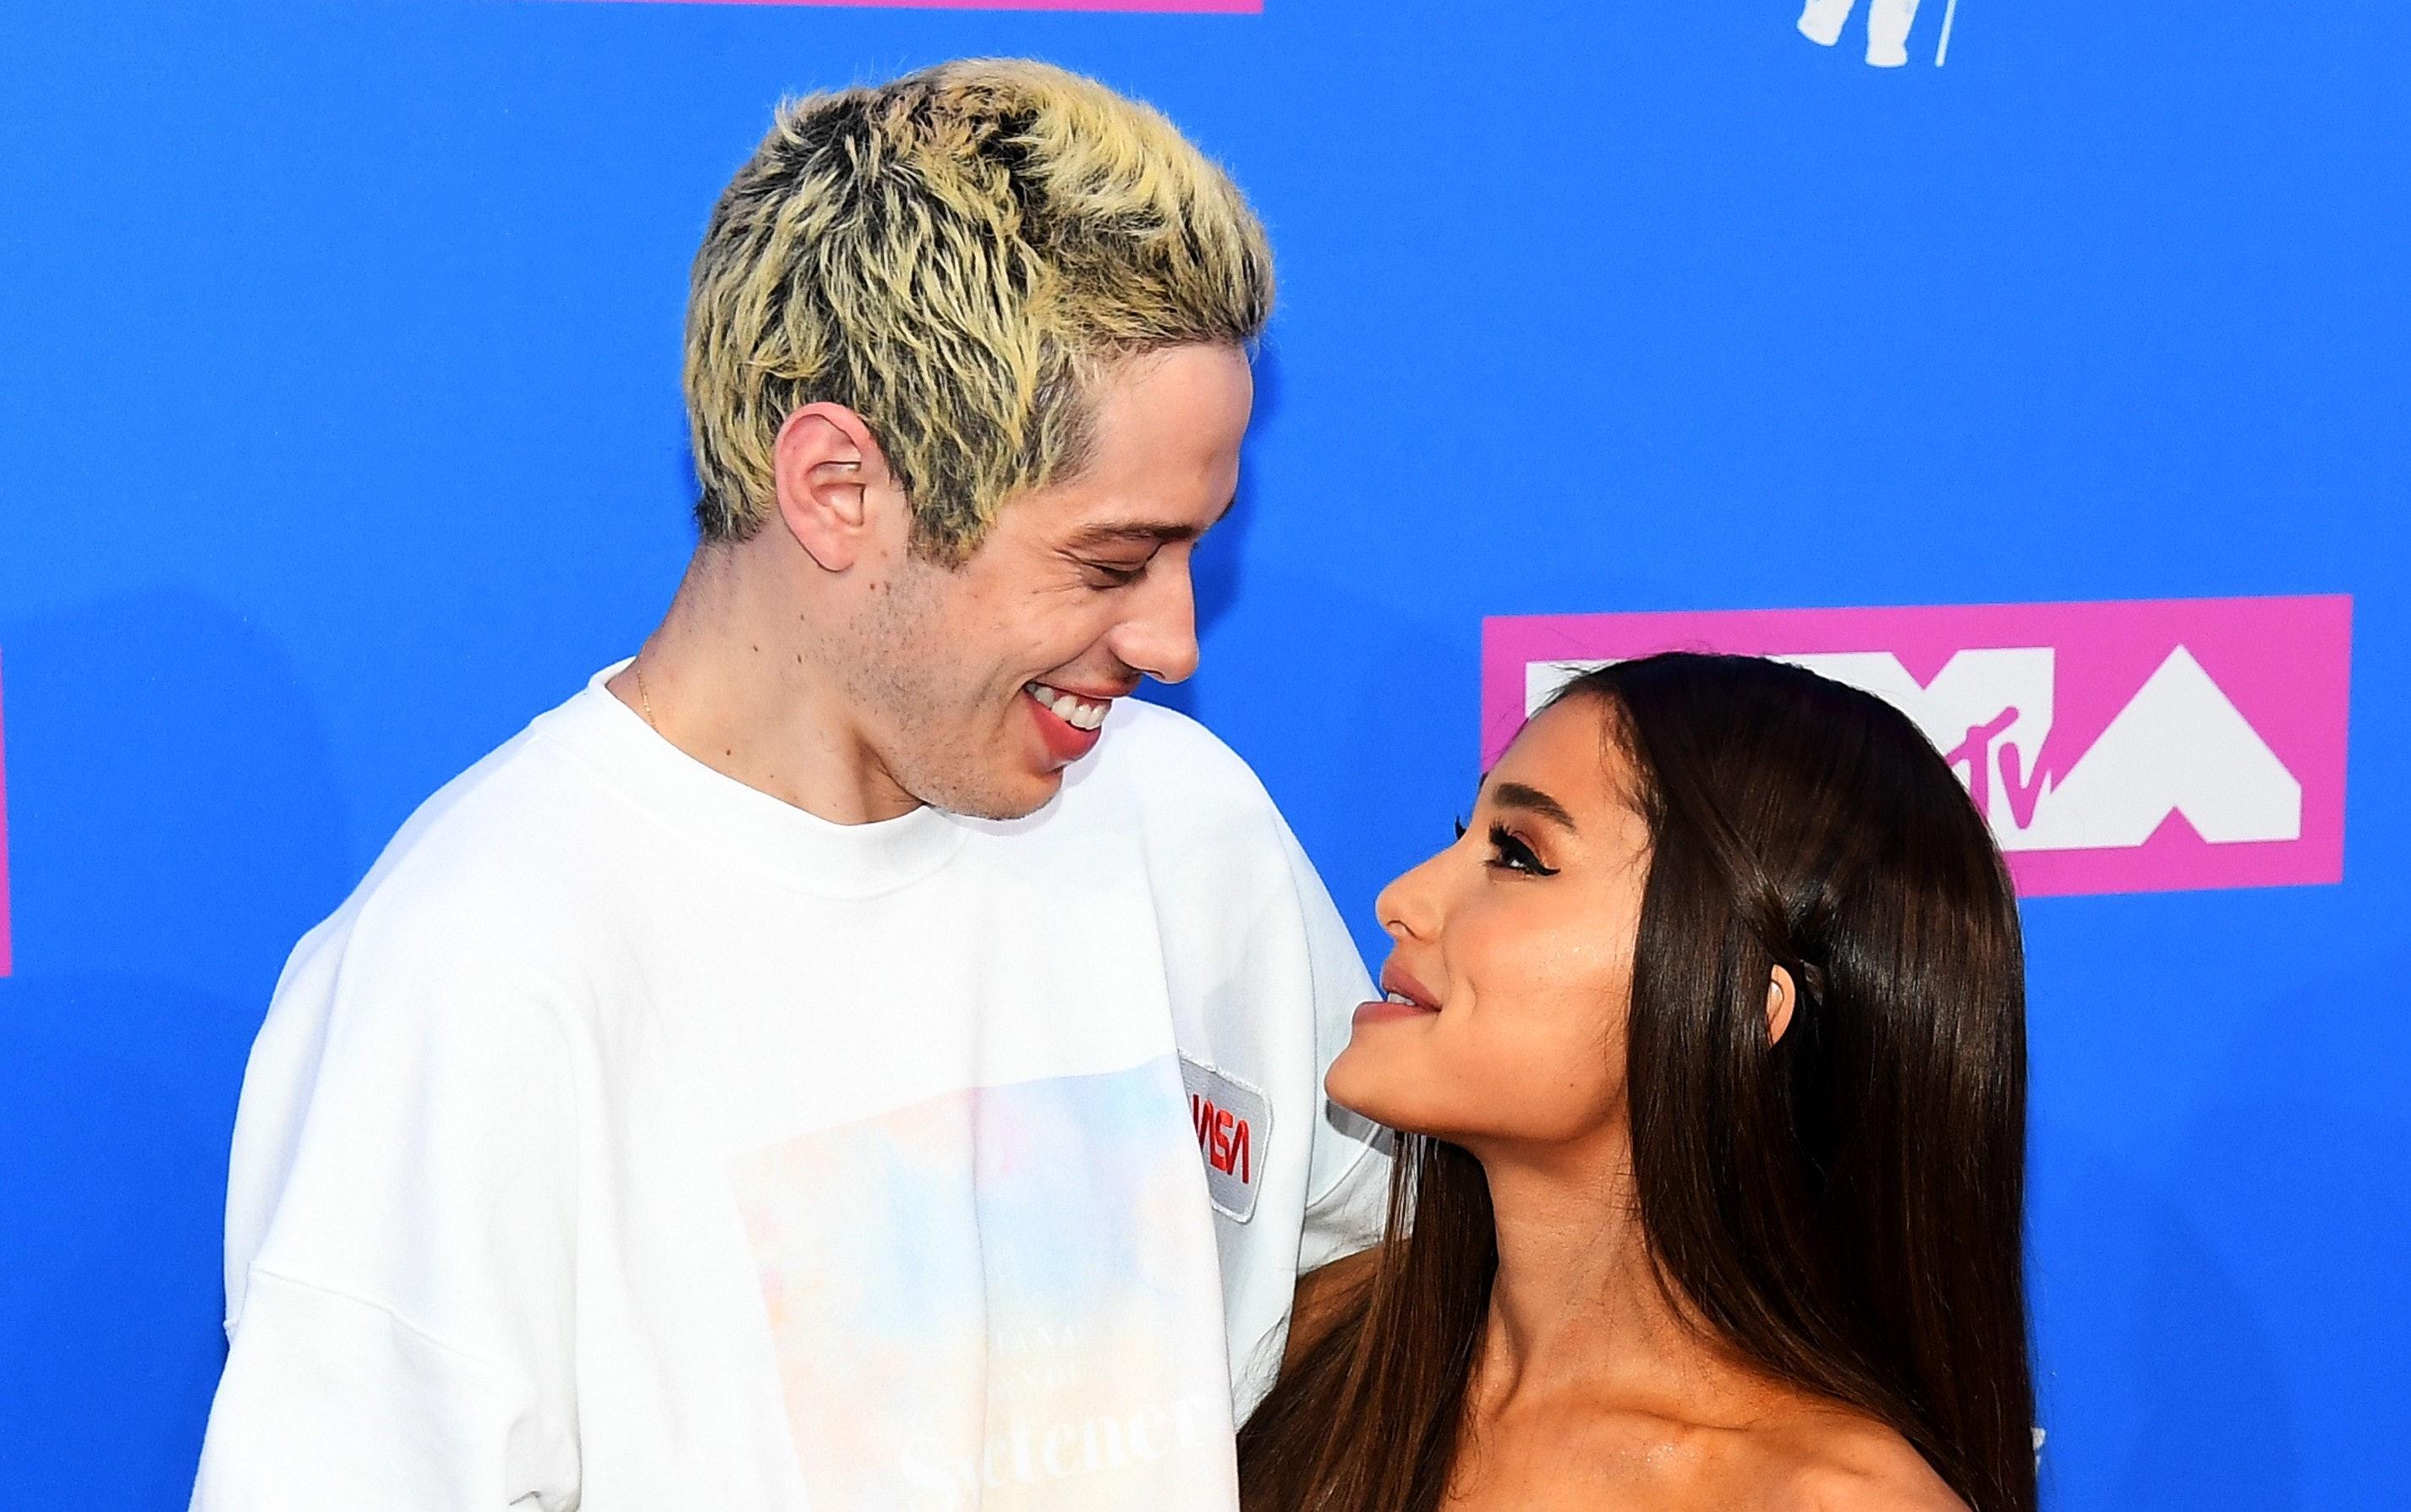 Kevin, dating Ariana Grande